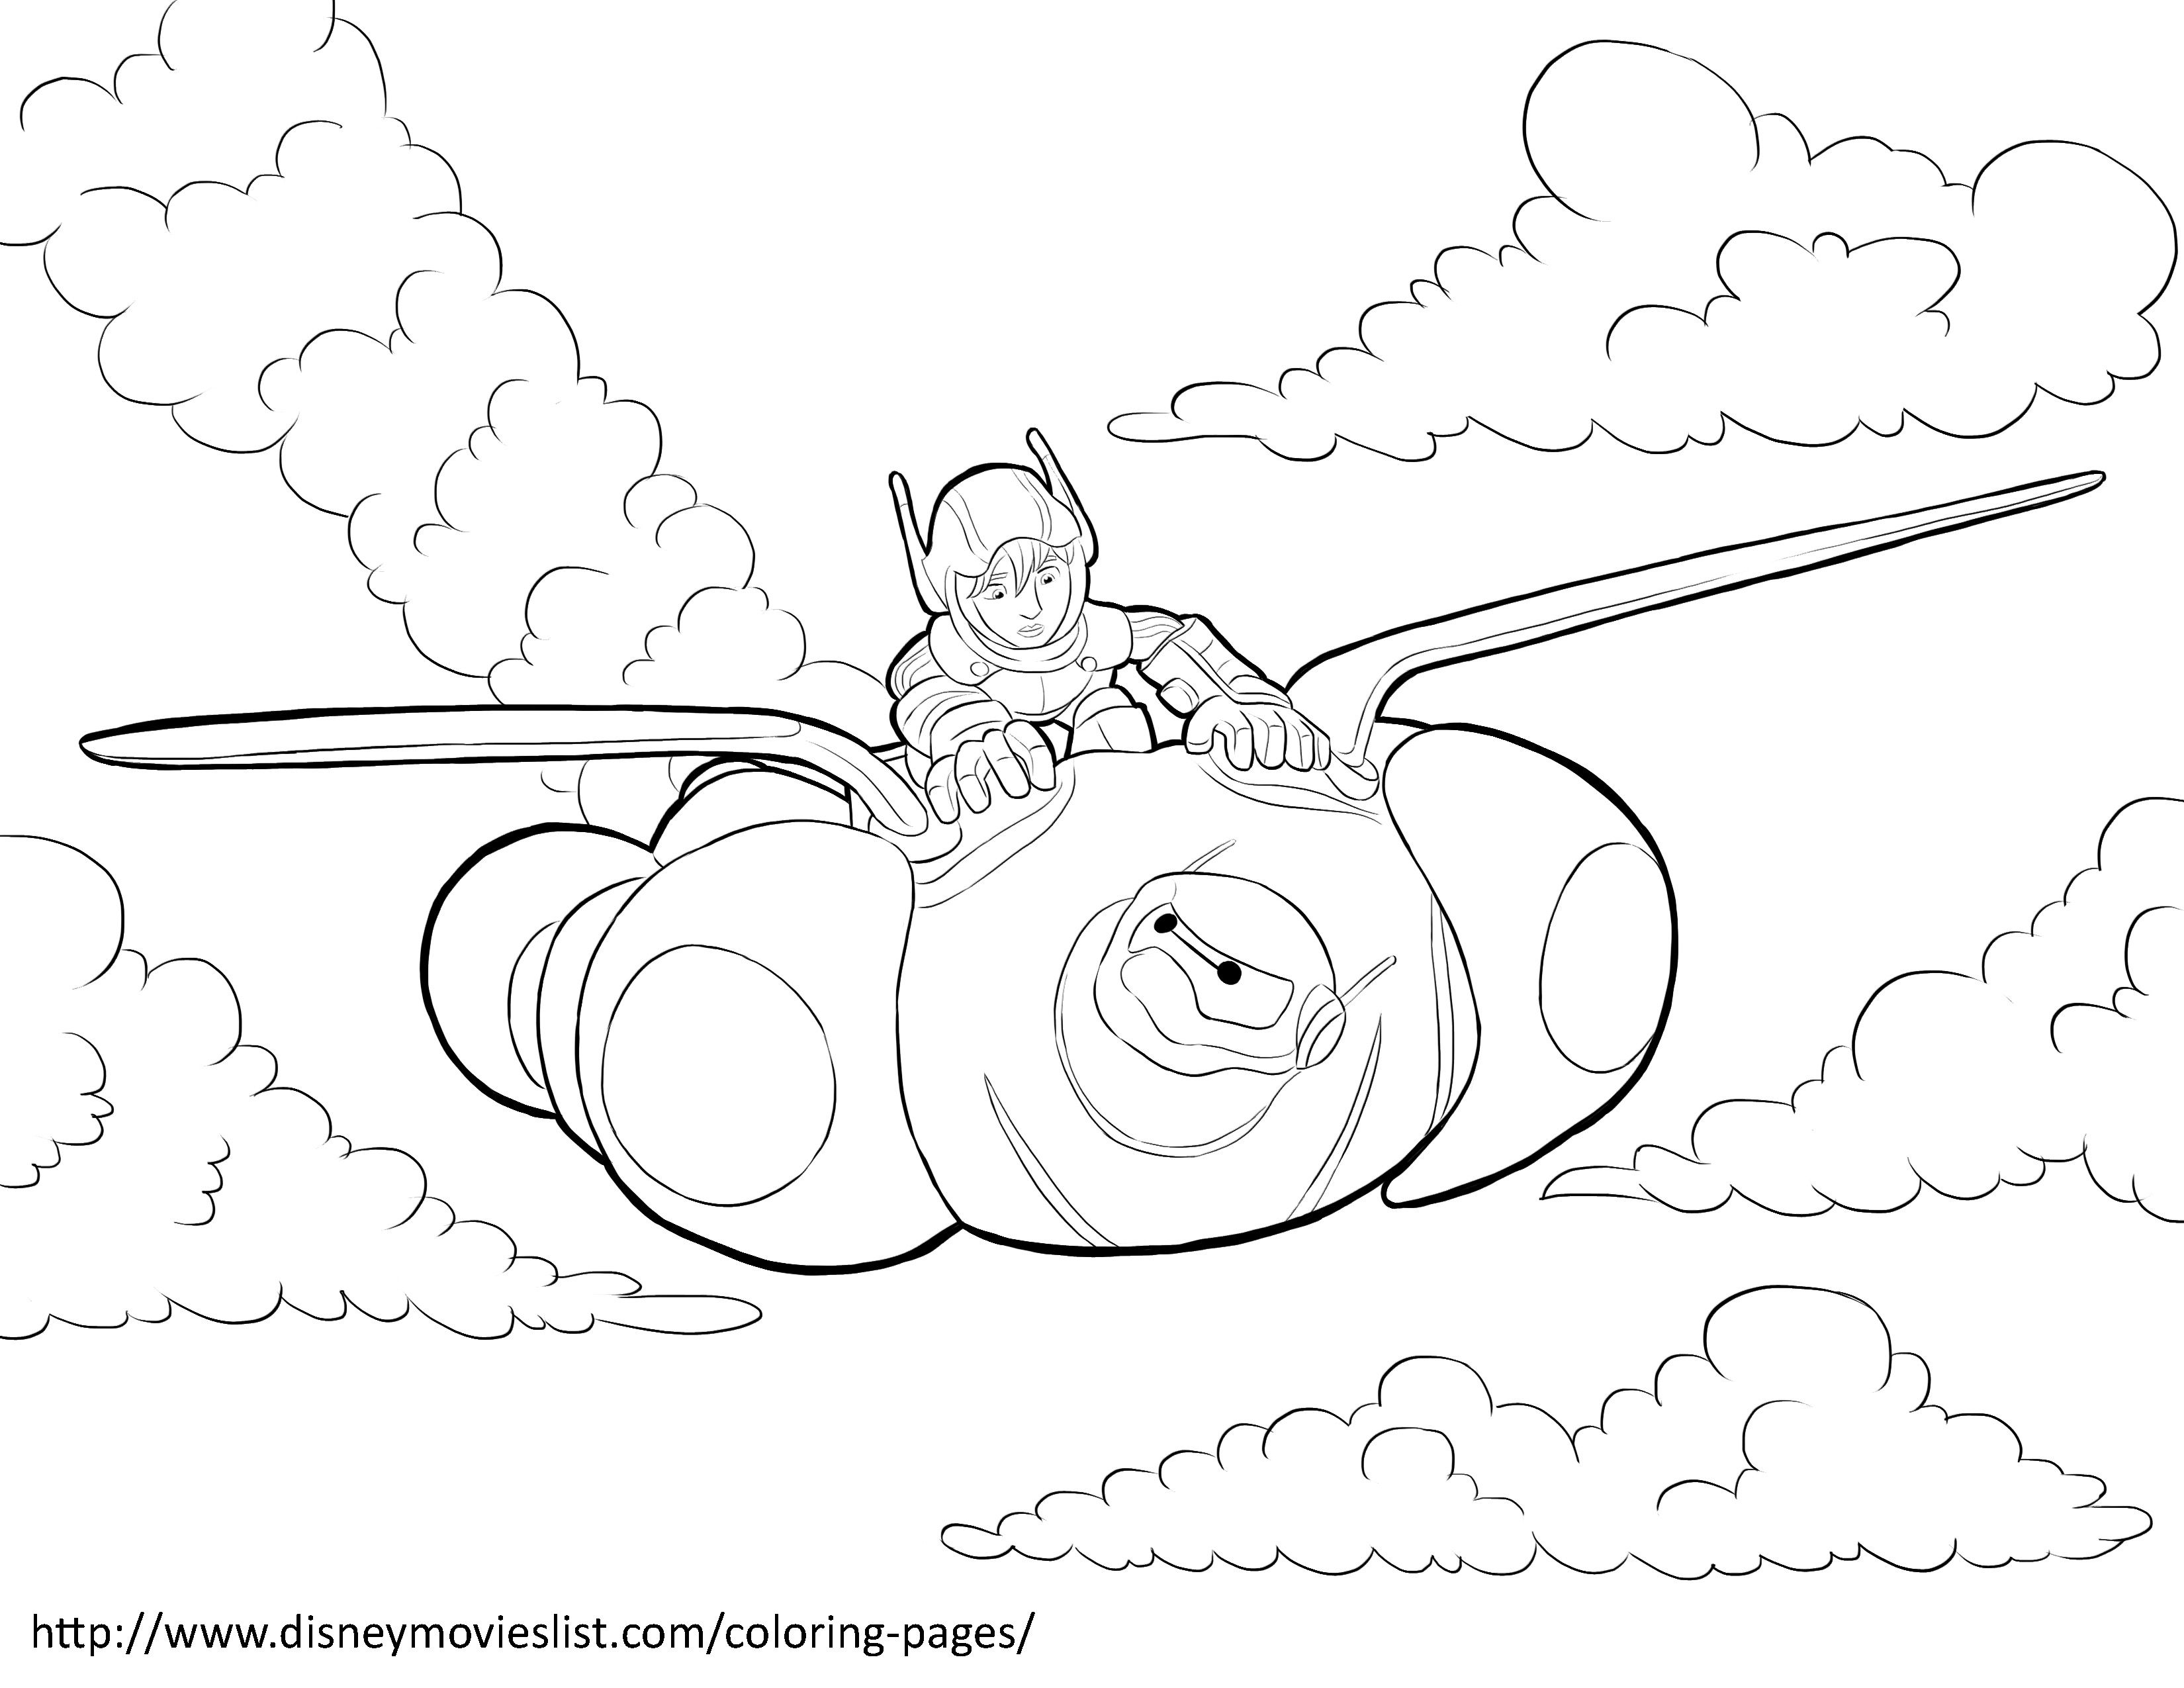 Disney\'s Big Hero 6Hiro and Baymax Flying Coloring Page | Big Hero 6 ...